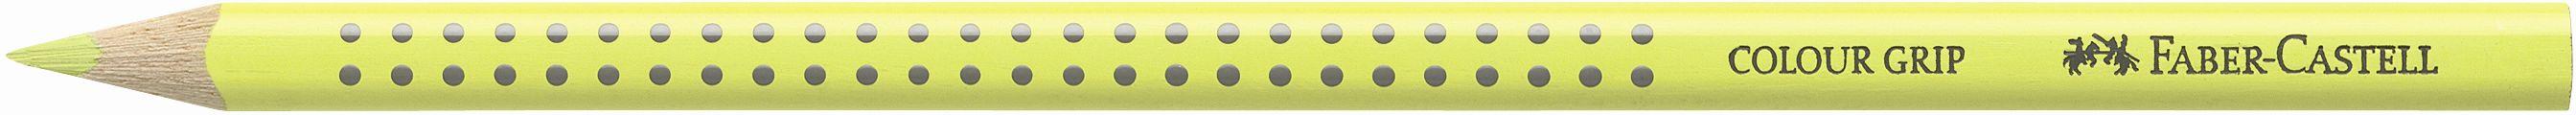 Pastelka Color Grip / 104 citronová Faber Castell - Akvarelové pastelky Faber Castell - Akvarelové pastelky